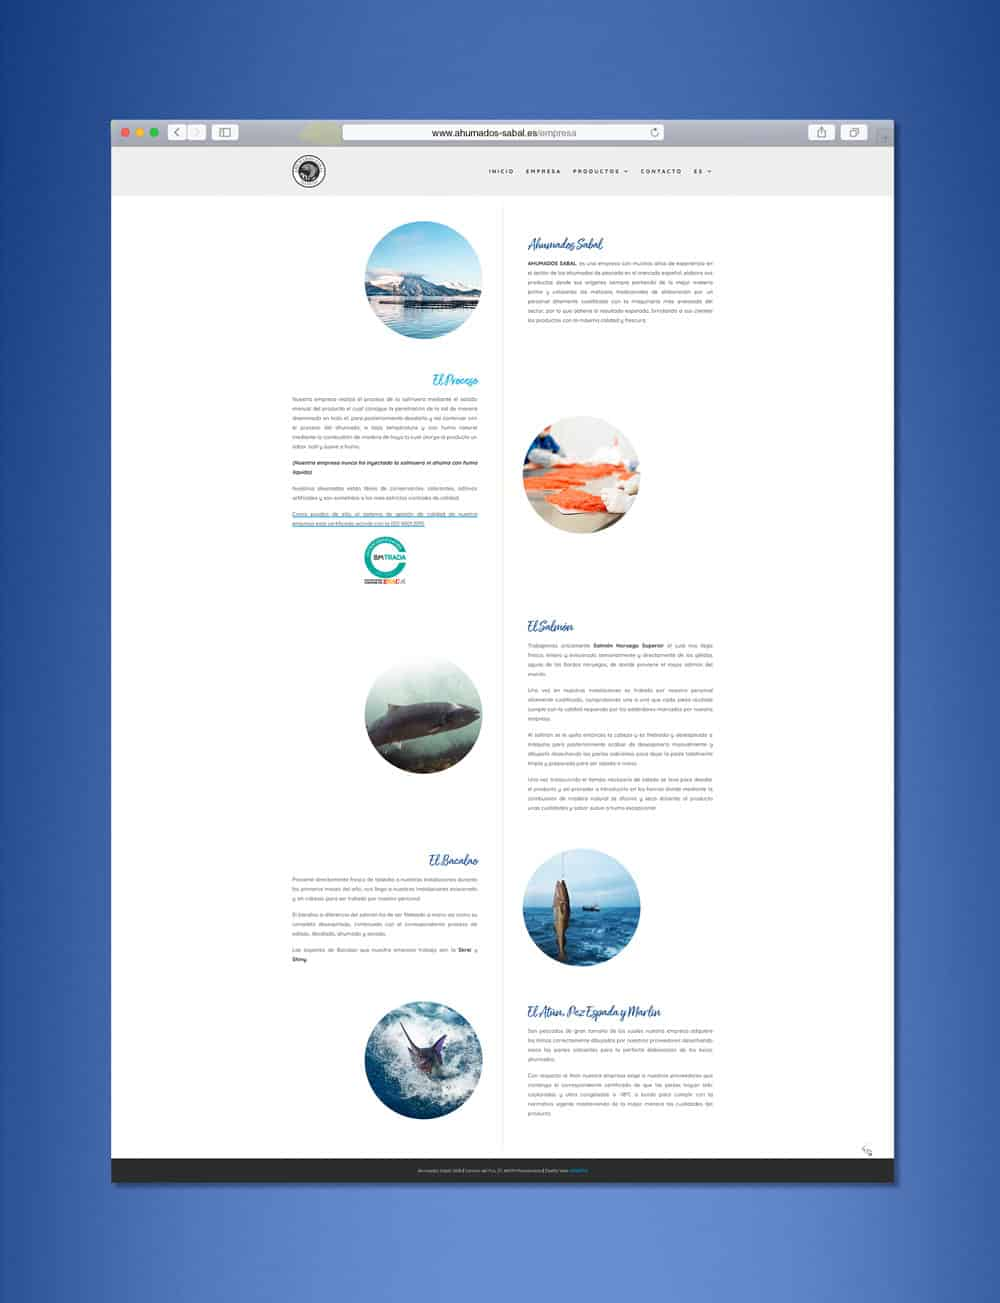 Ahumados Sabal - Web Empresa